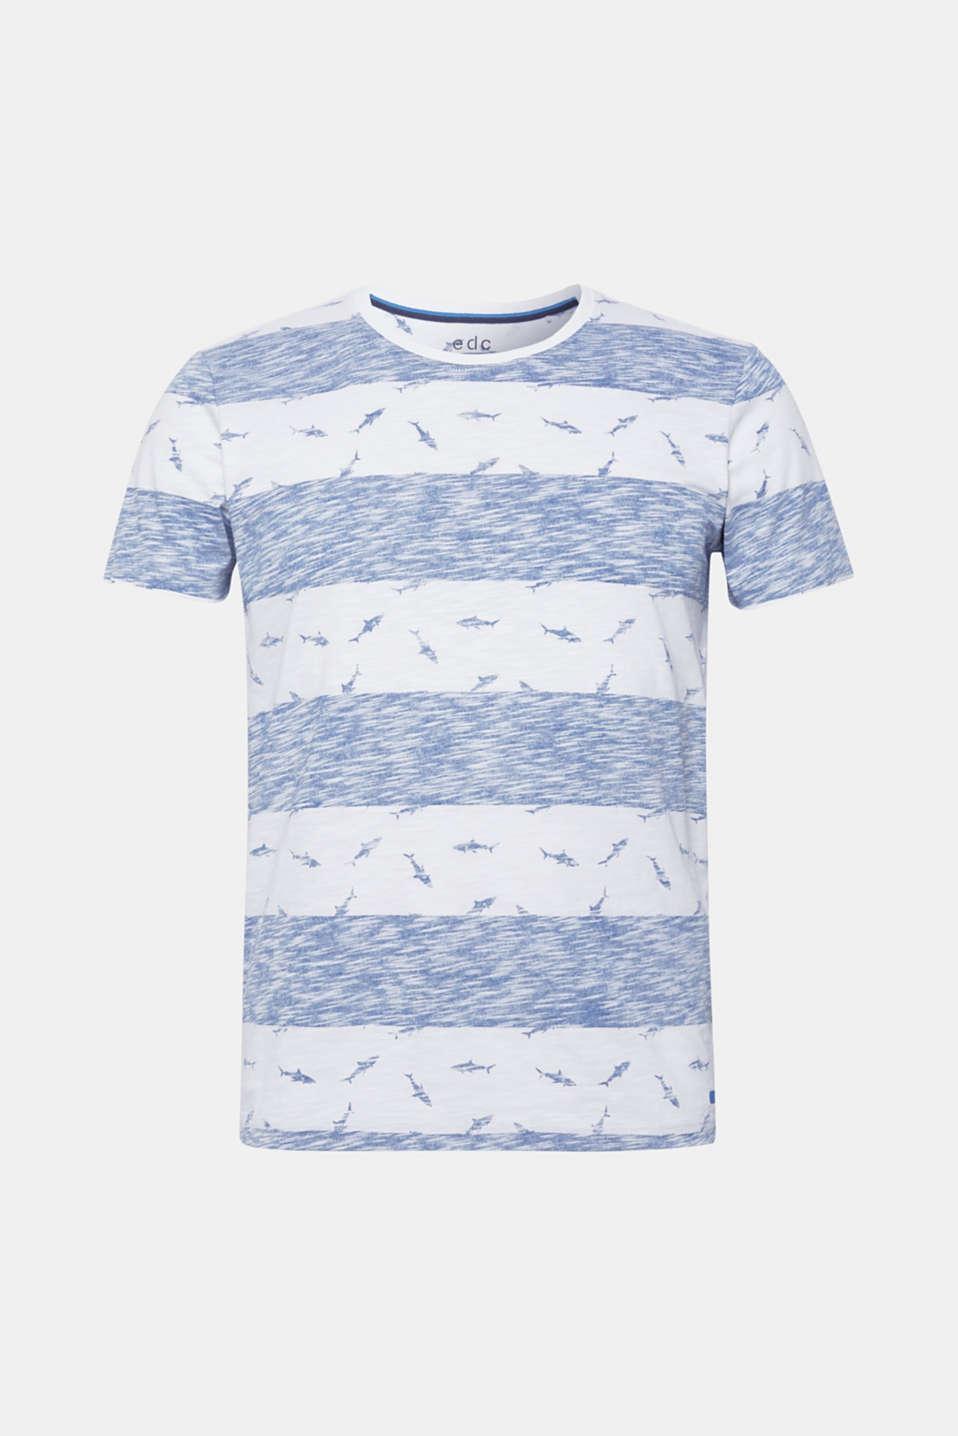 Slub jersey shirt with a shark print, BLUE, detail image number 6